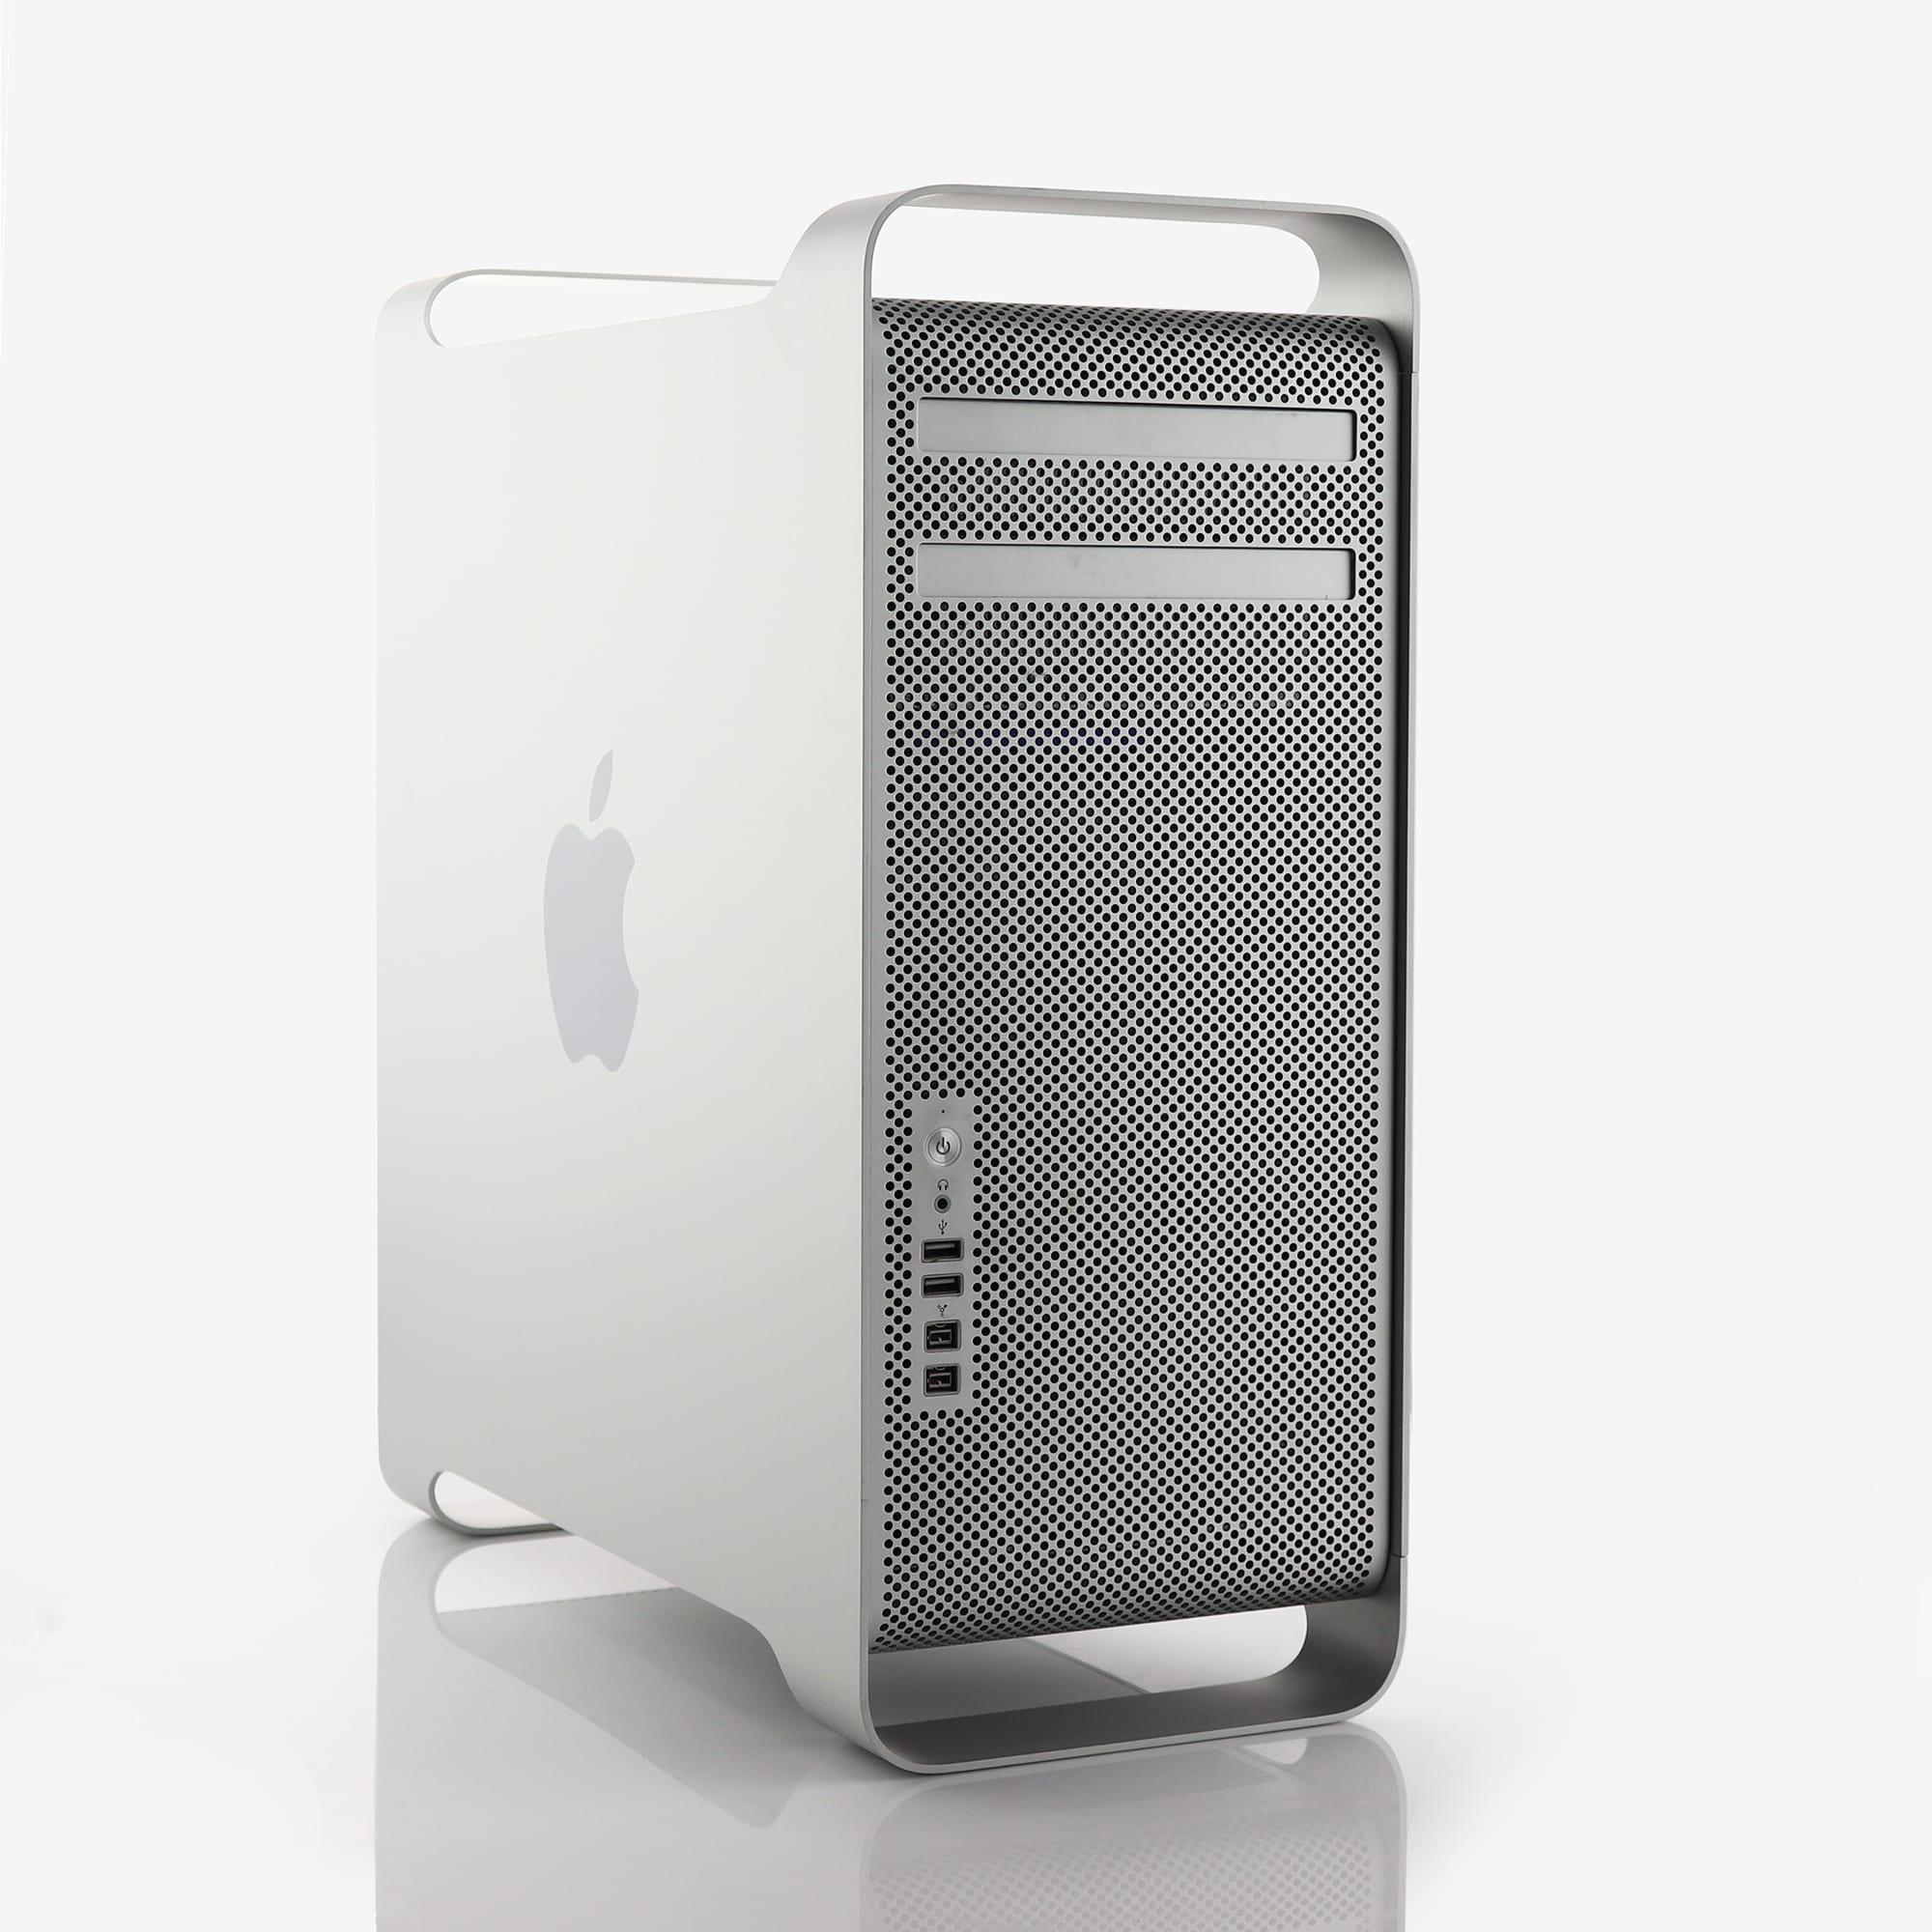 1 x Apple Mac Pro Intel Xeon 3.46 GHz 12 Core (2012)